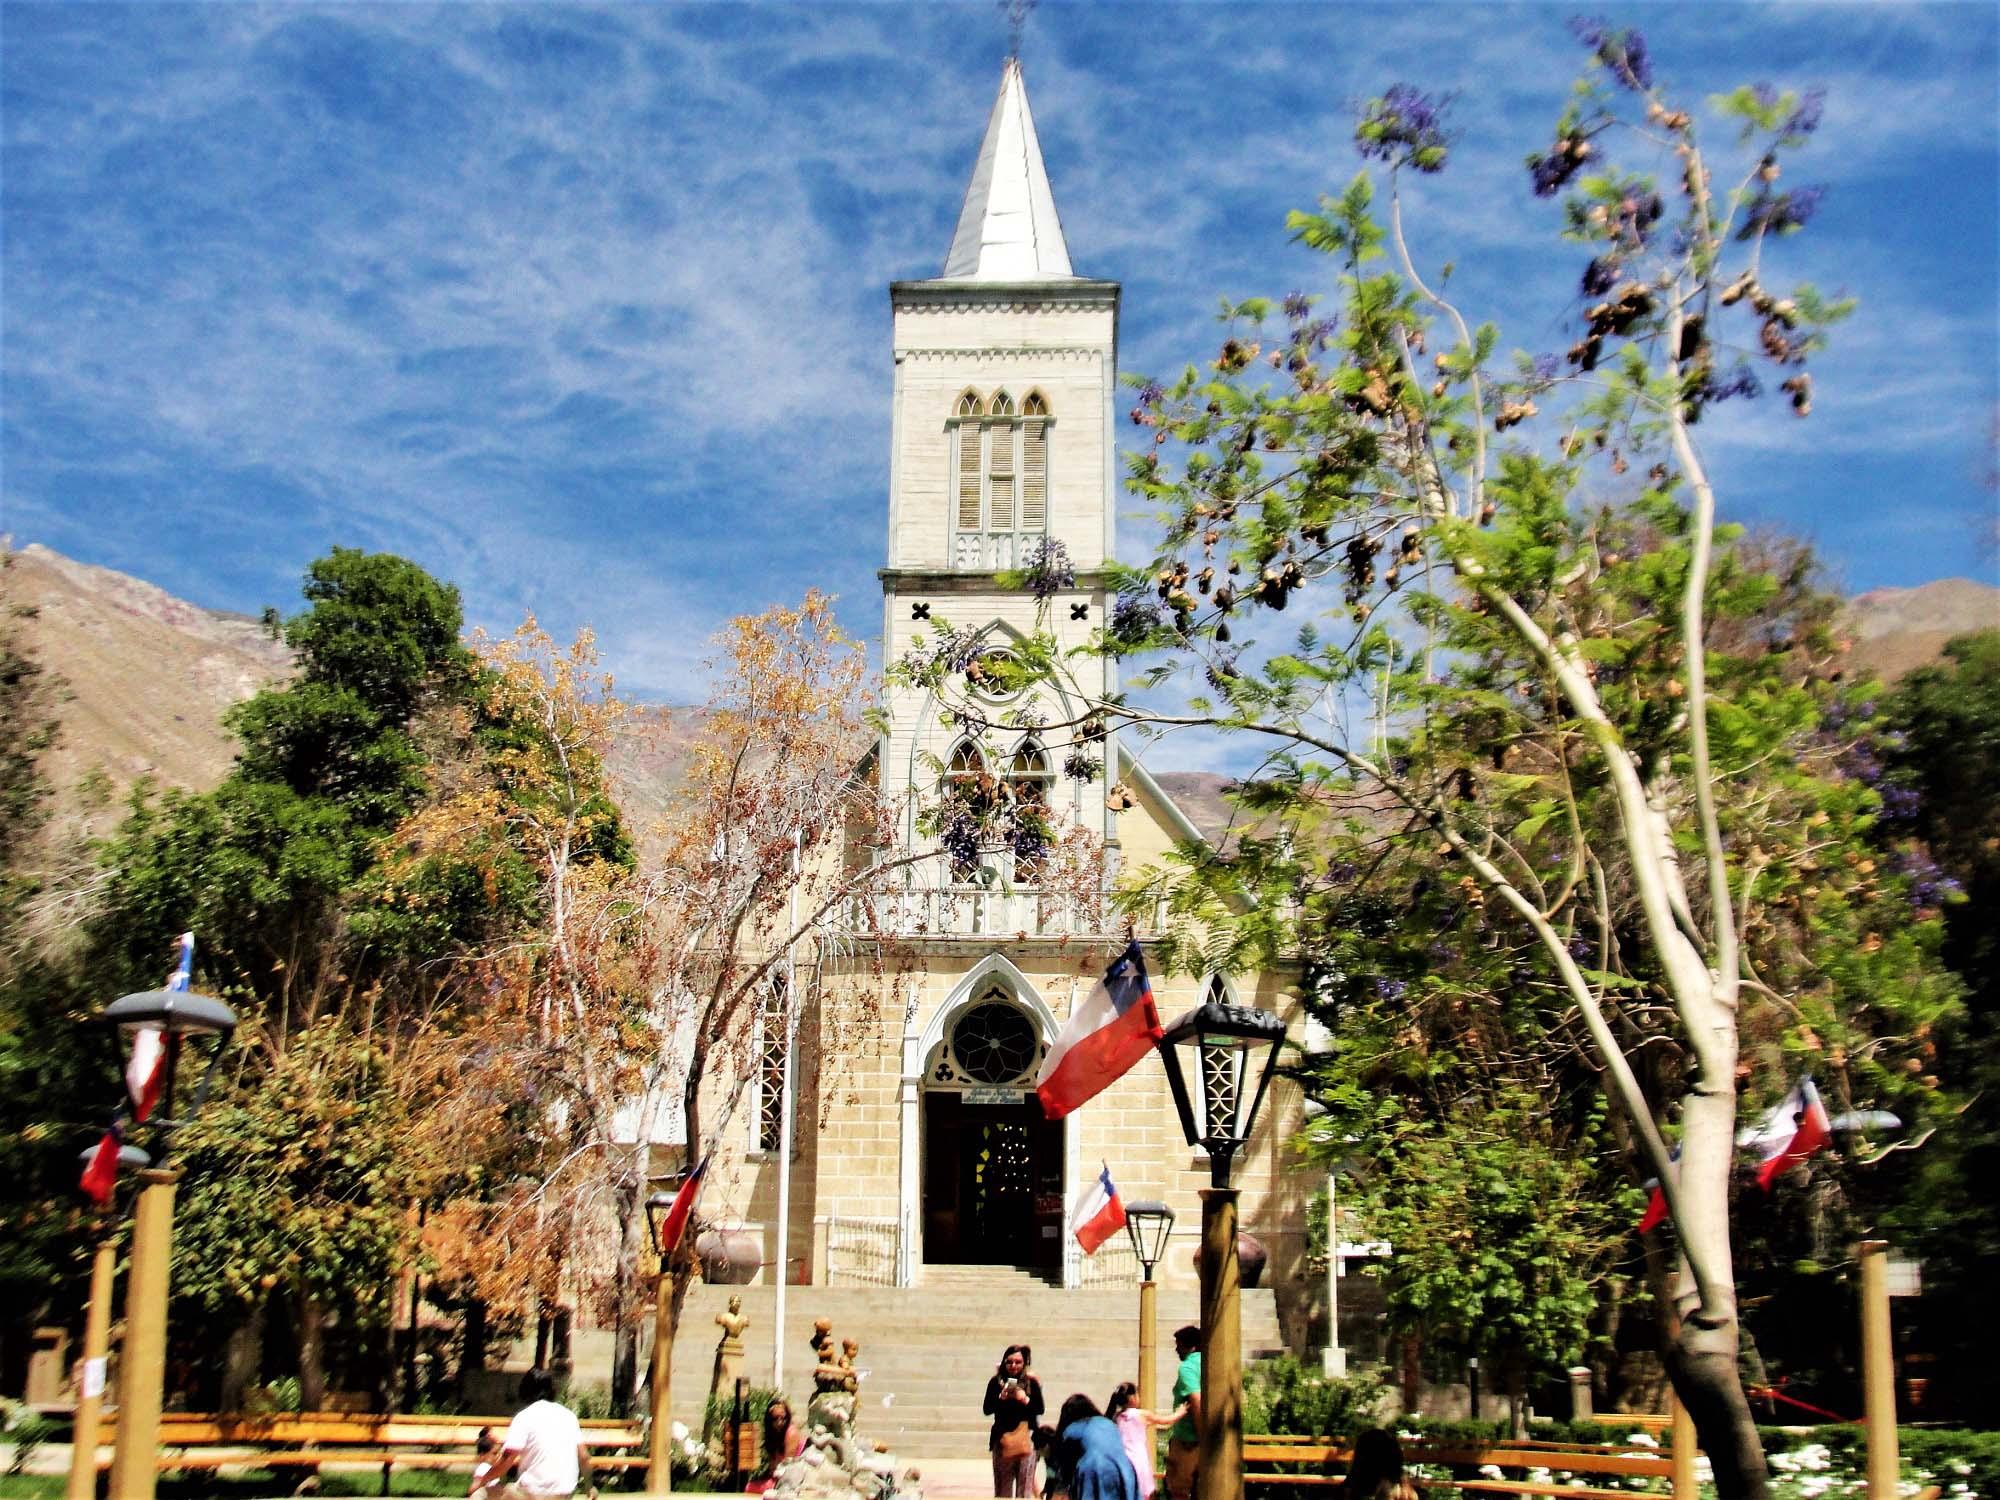 turismochile_piscoelqui_iglesia